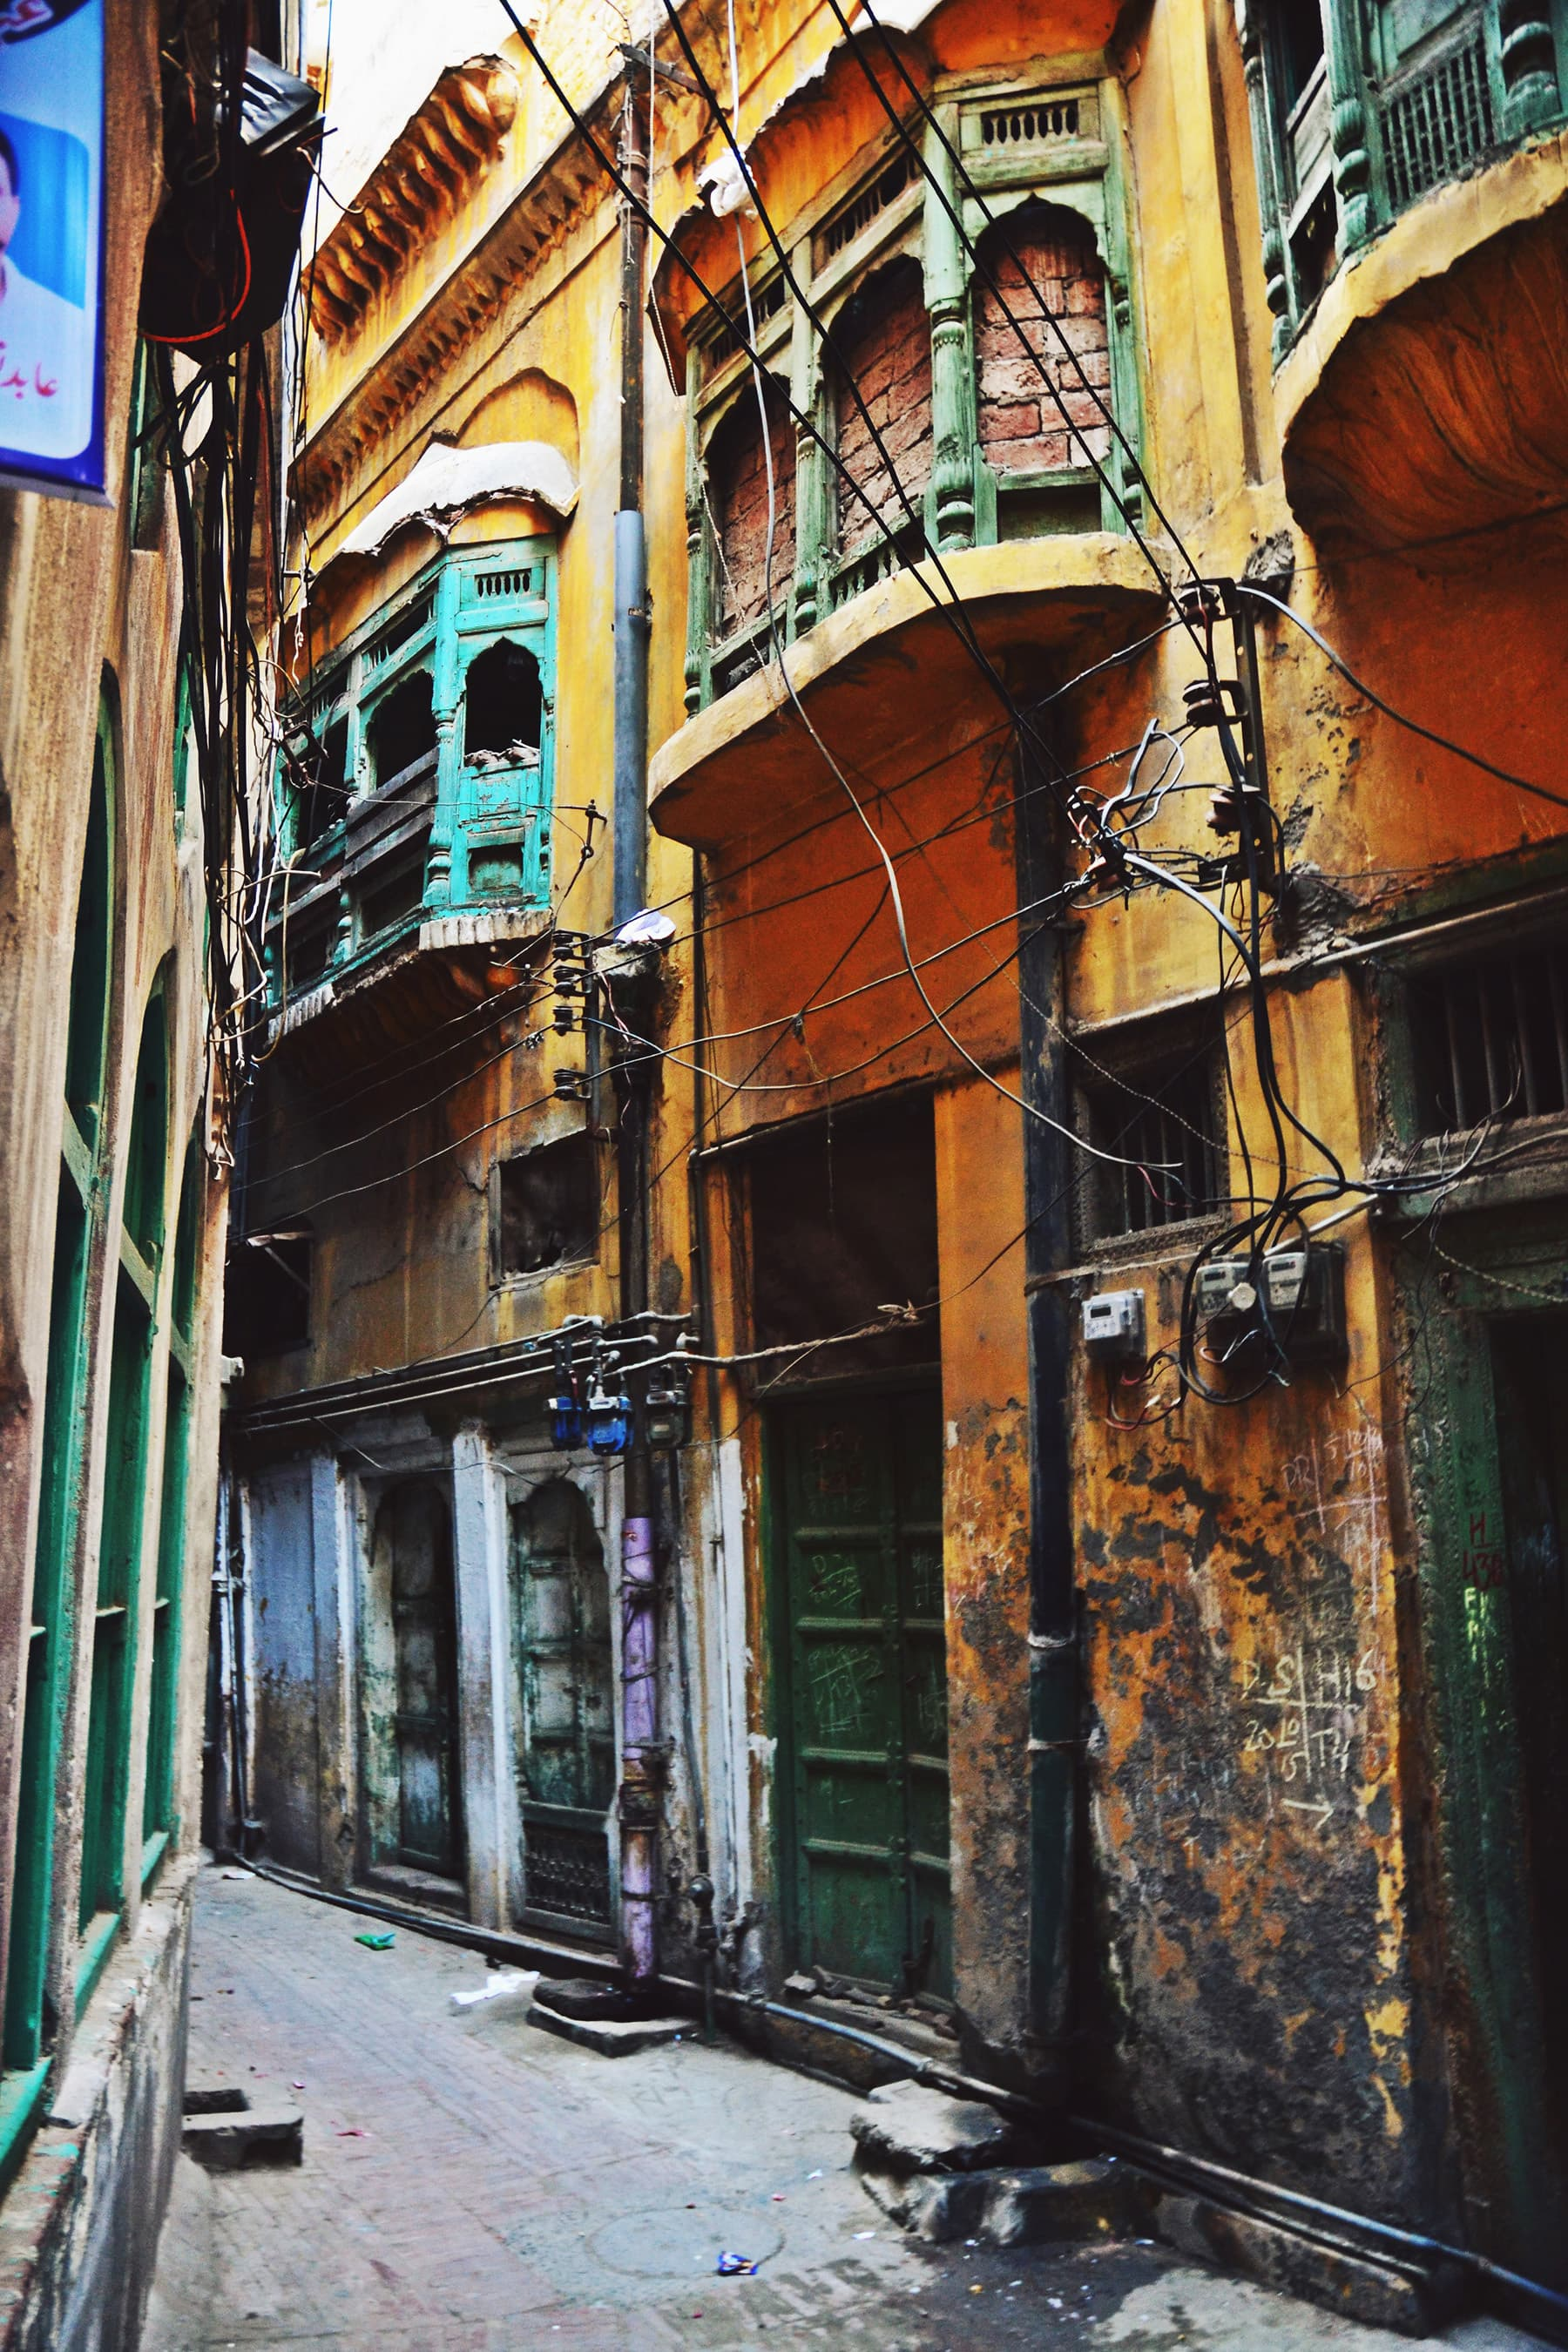 Balconies with wooden work in Mohalla Shian Kashmirian. —Photo by Abdullah Khan